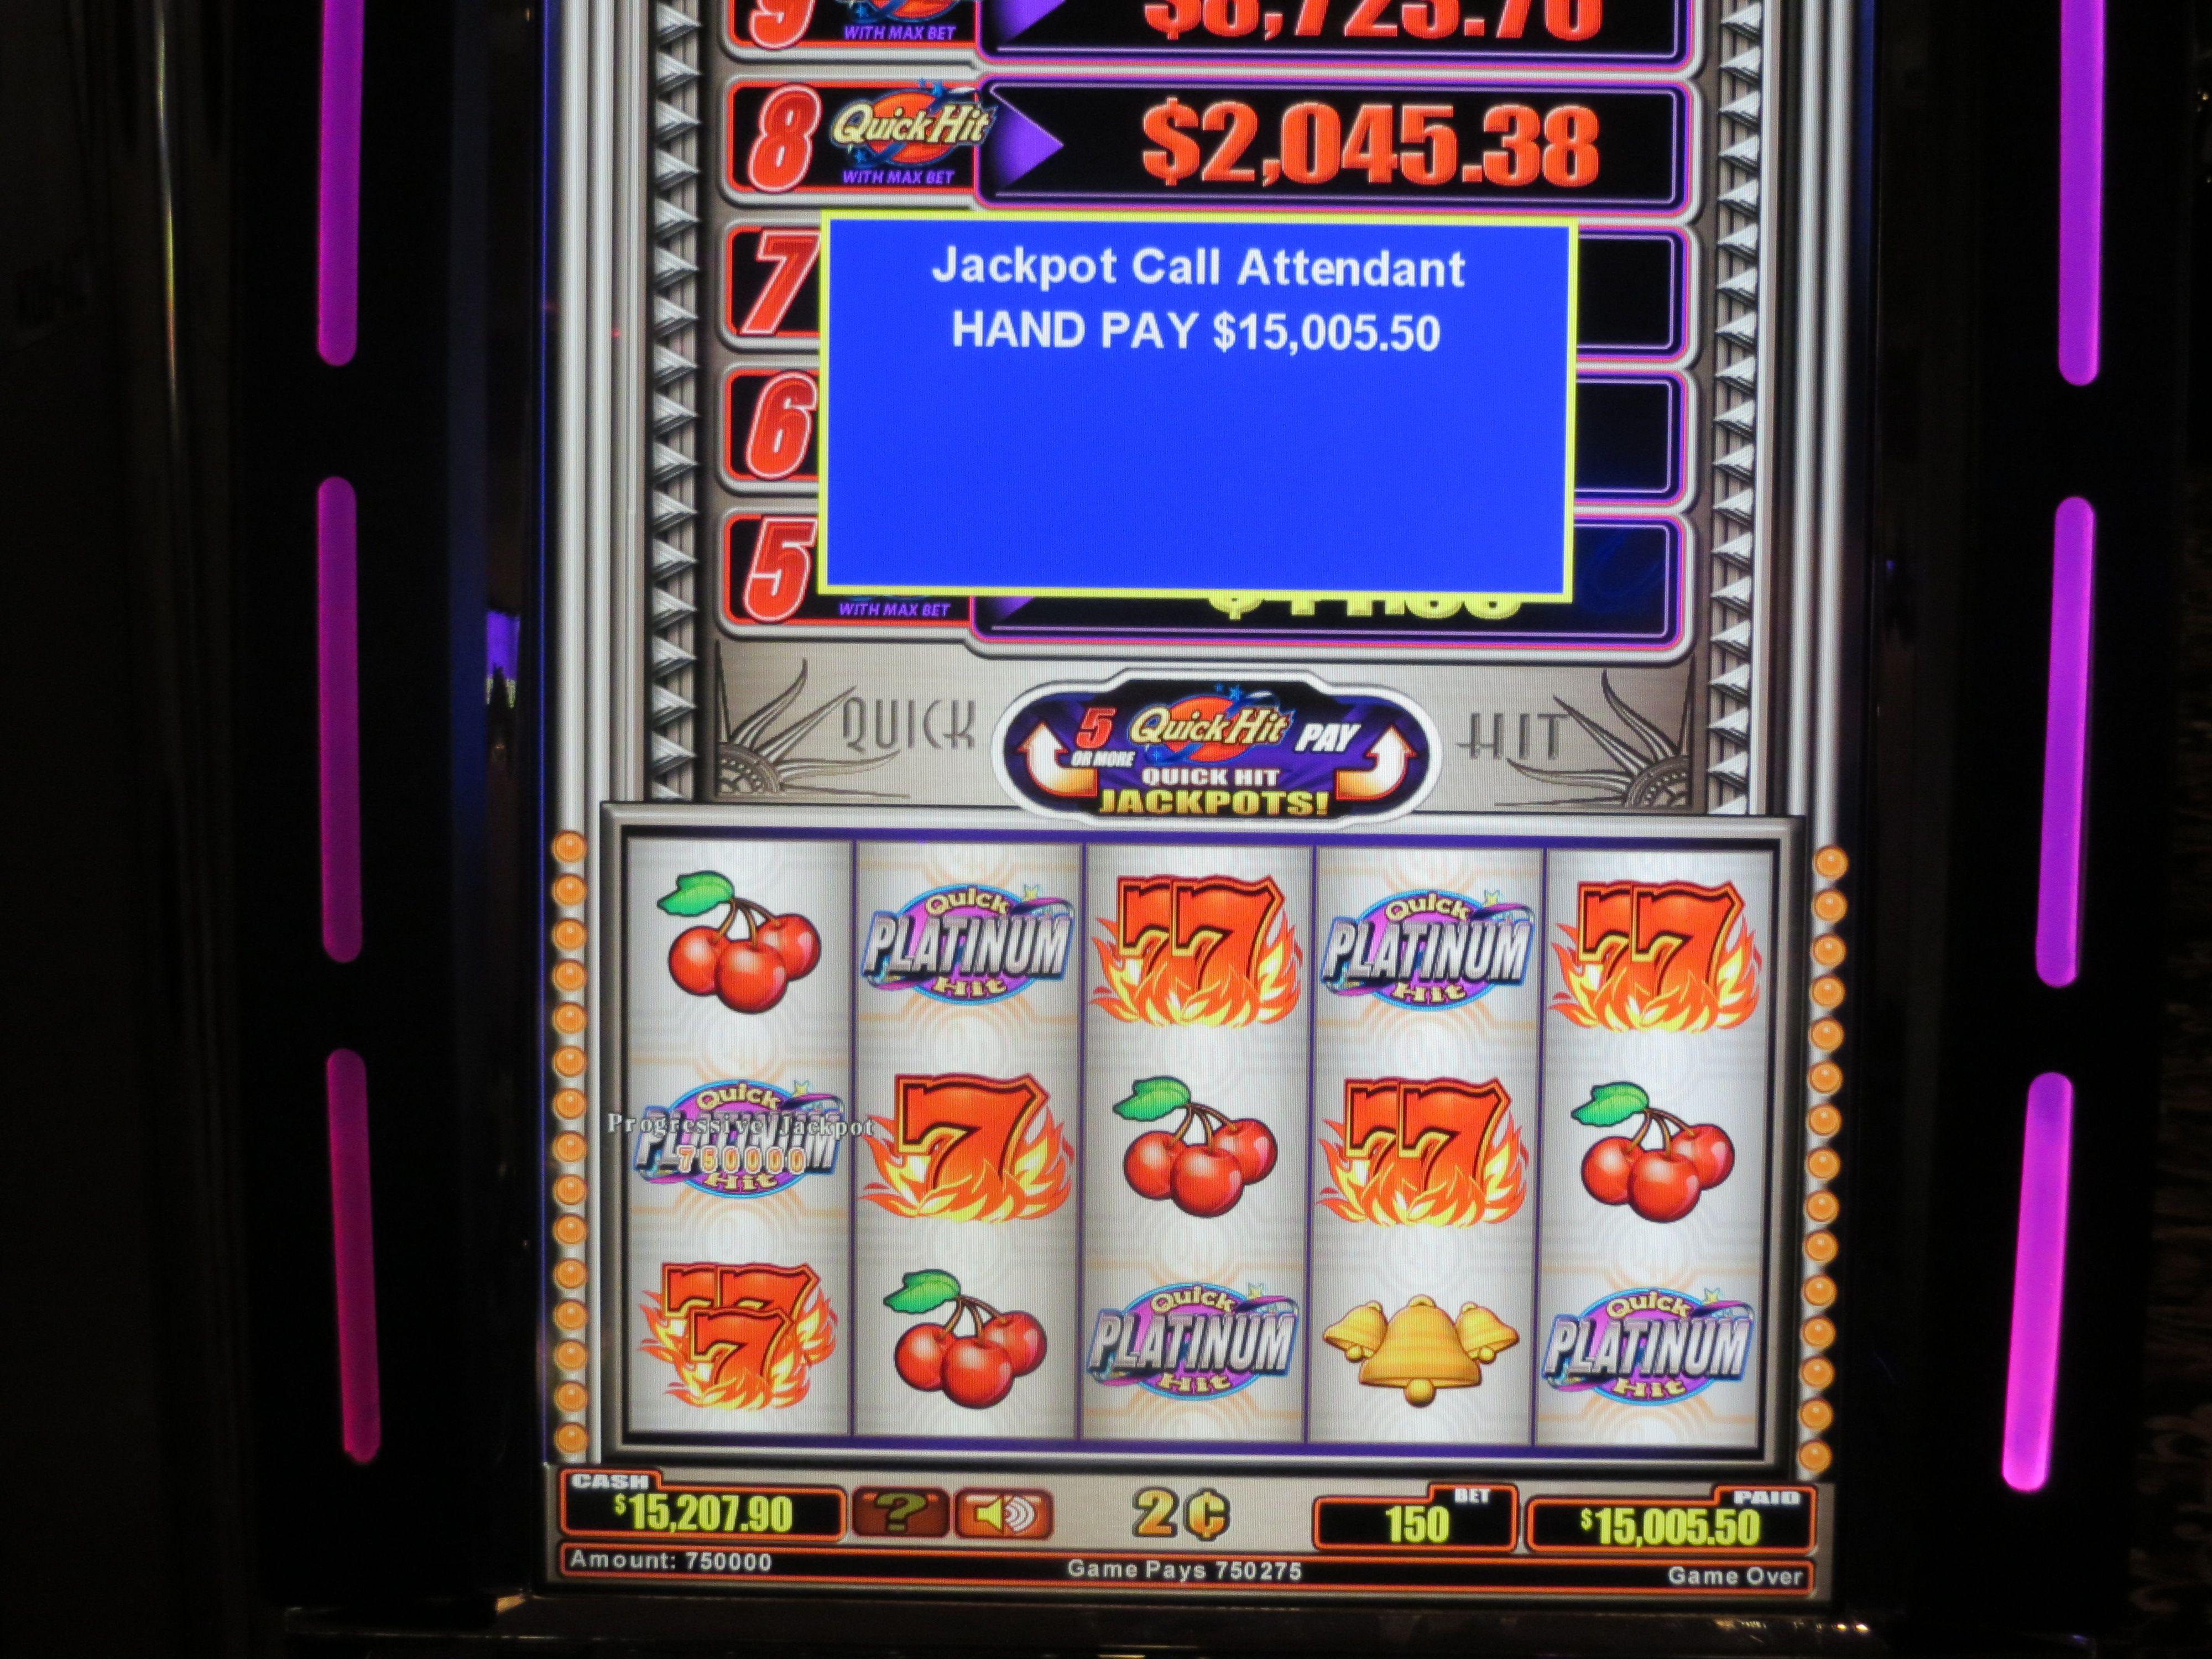 Huff and puff slot machine las vegas